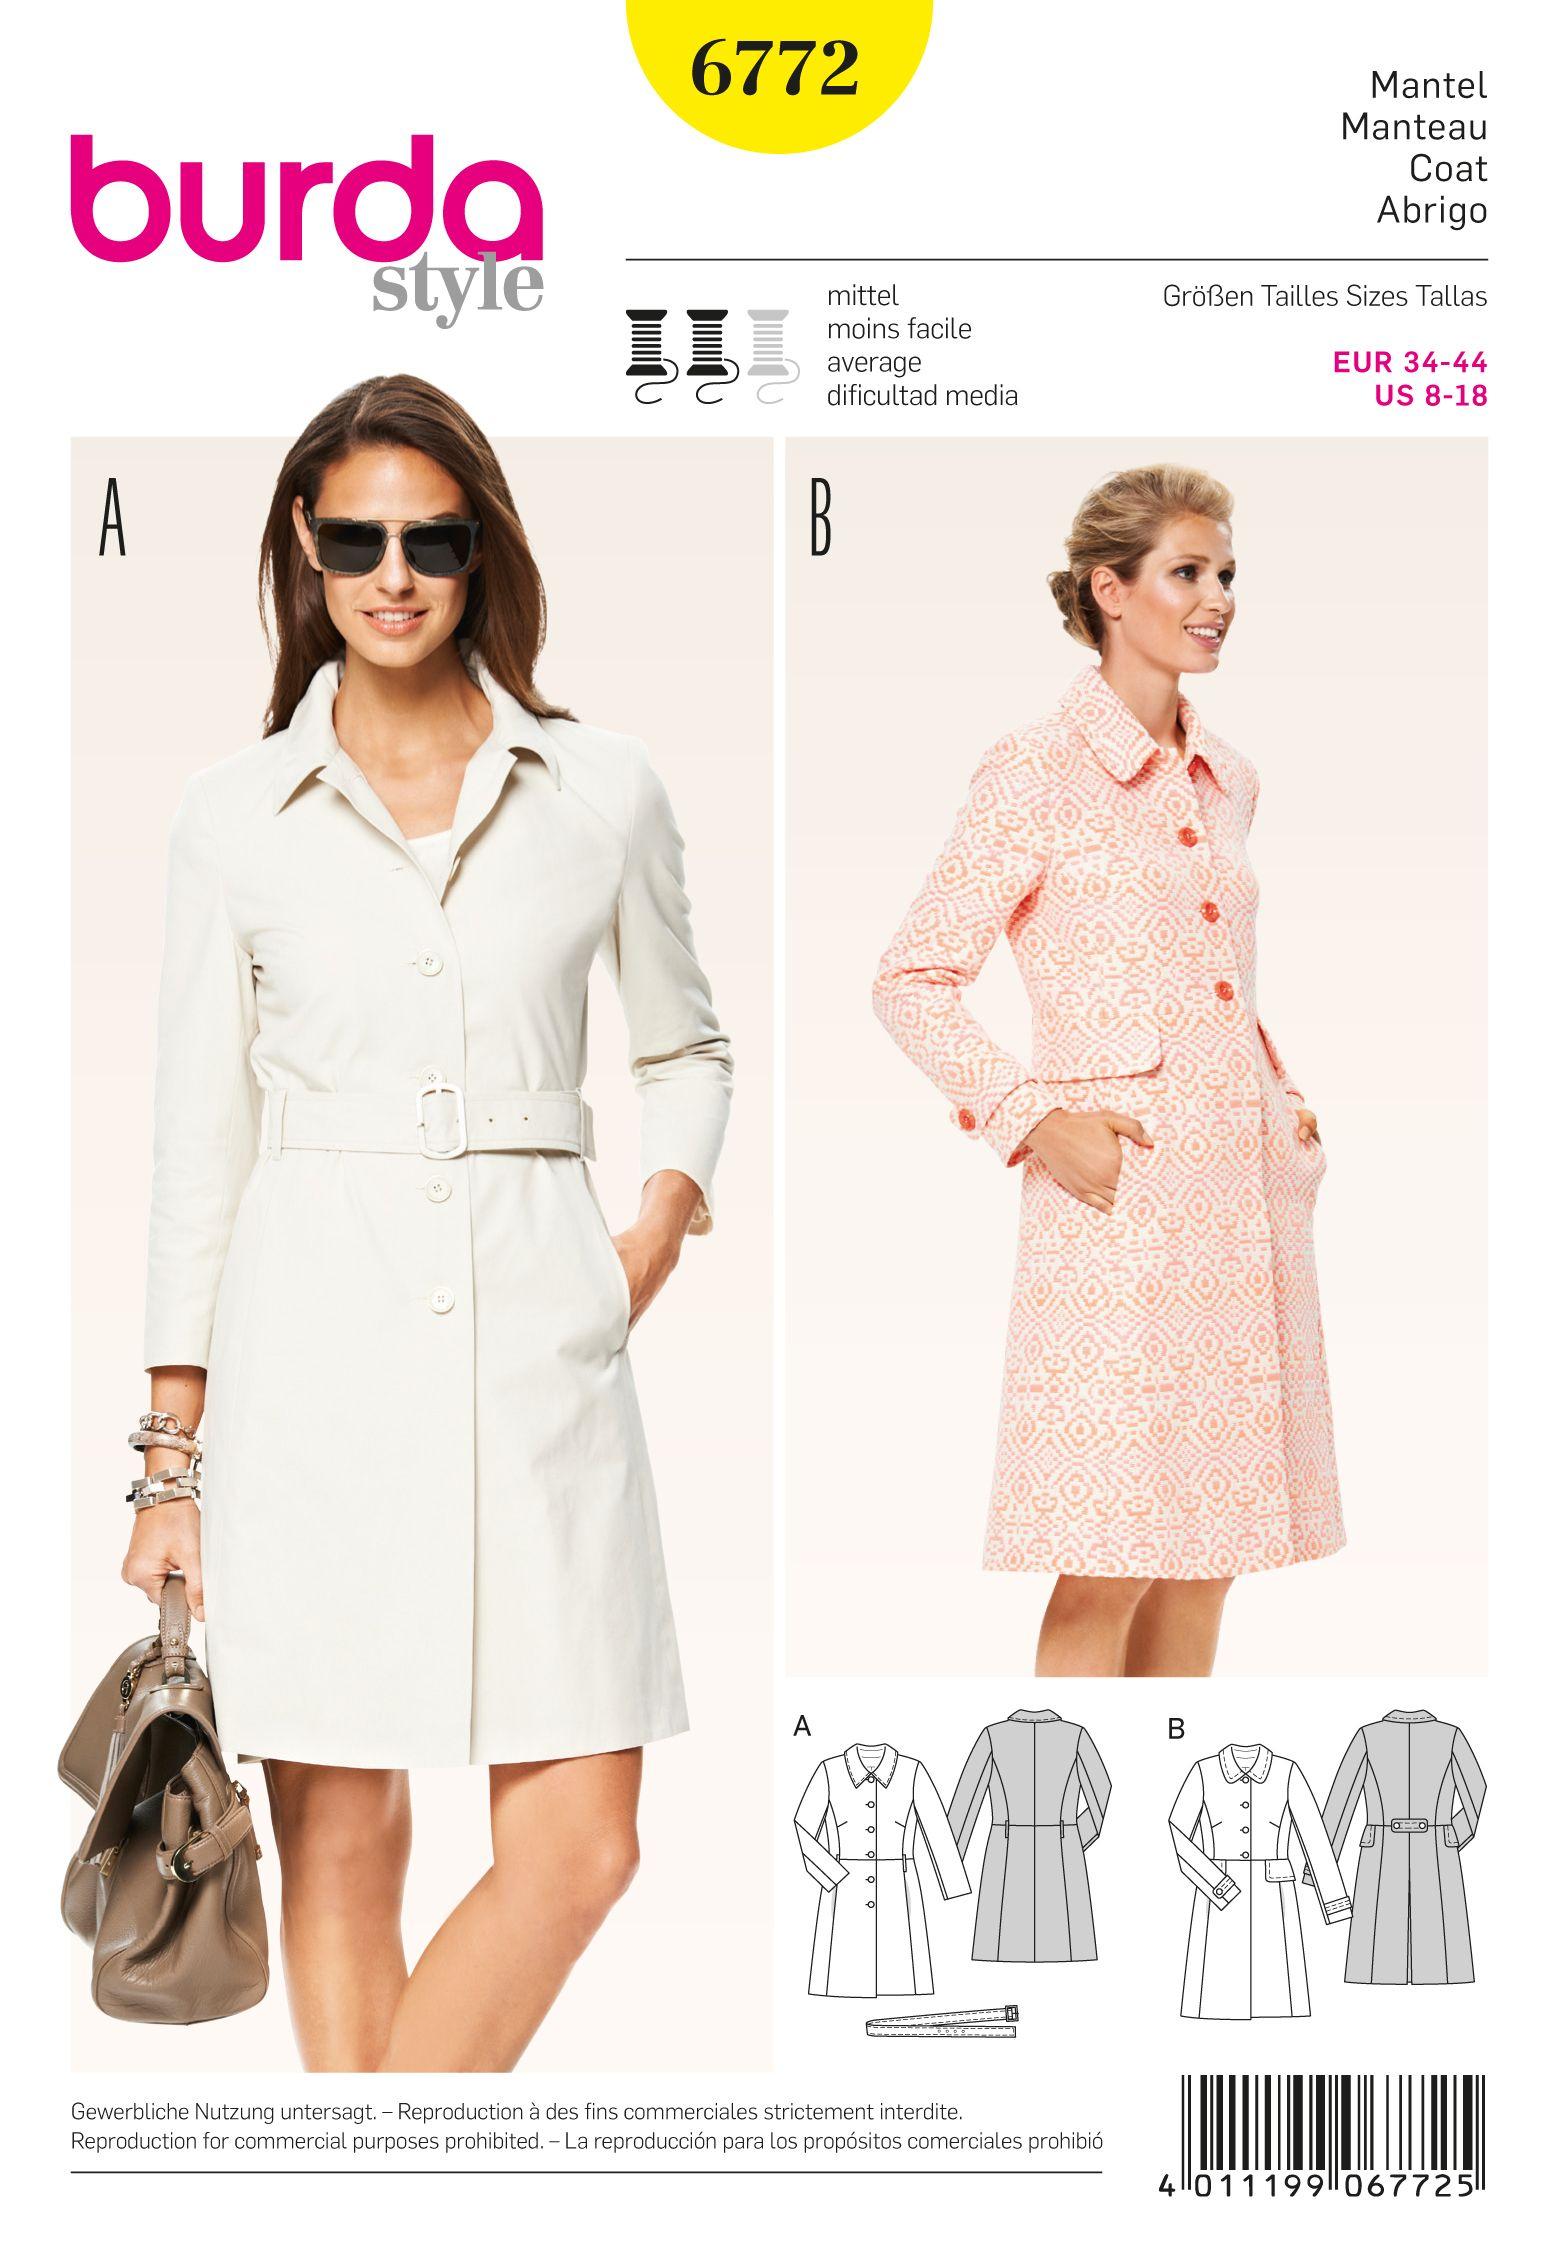 Burda 6772 Burda Style Jackets, Coats, Vests | Costura